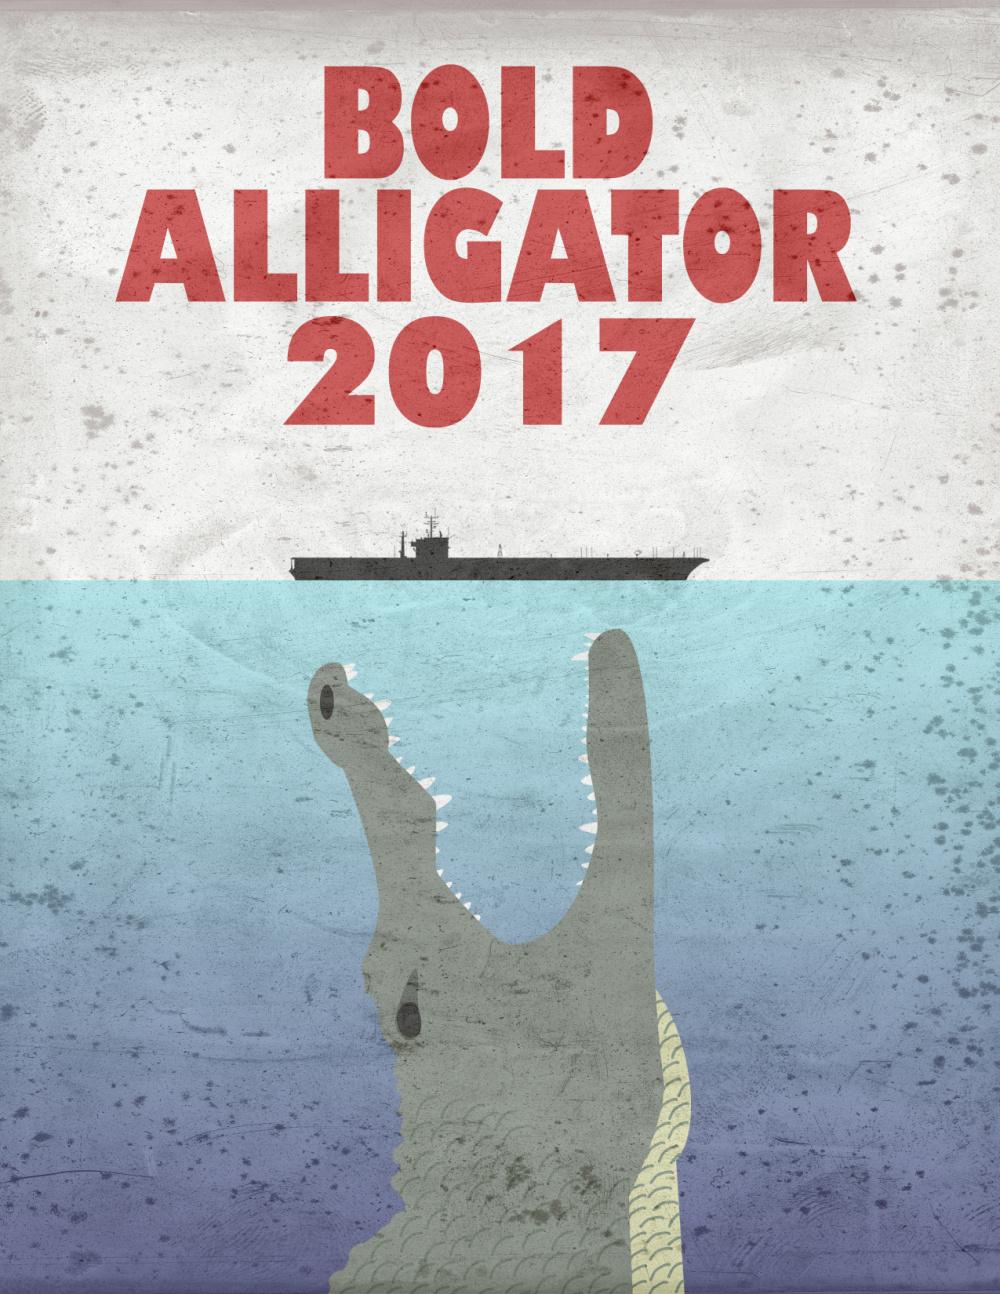 Bold Alligator 2017